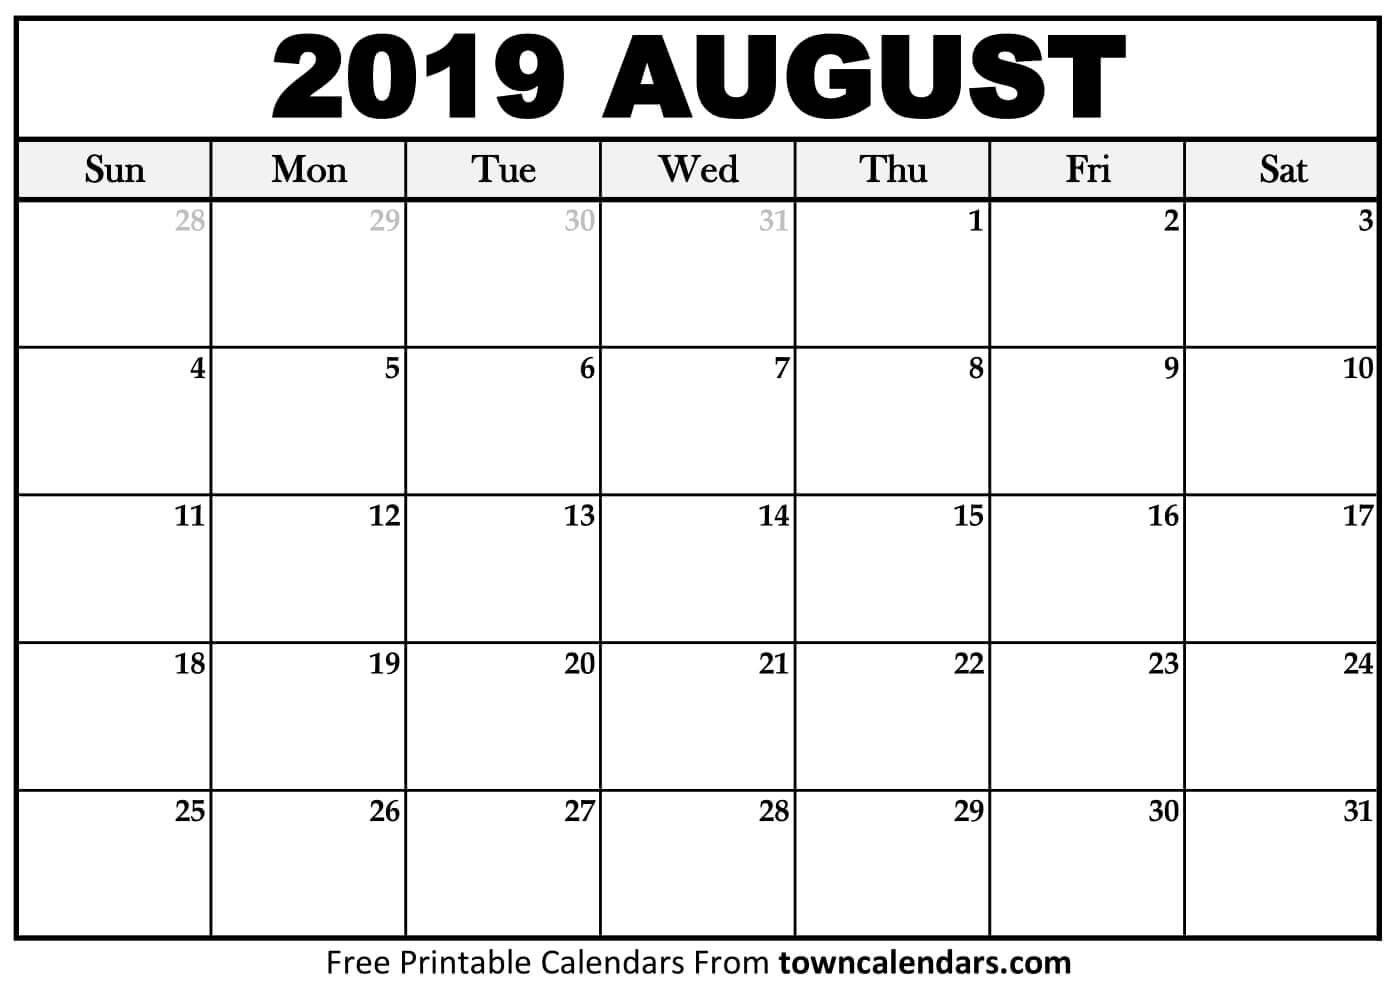 Printable August 2019 Calendar – Towncalendars August 1 2019 Calendar